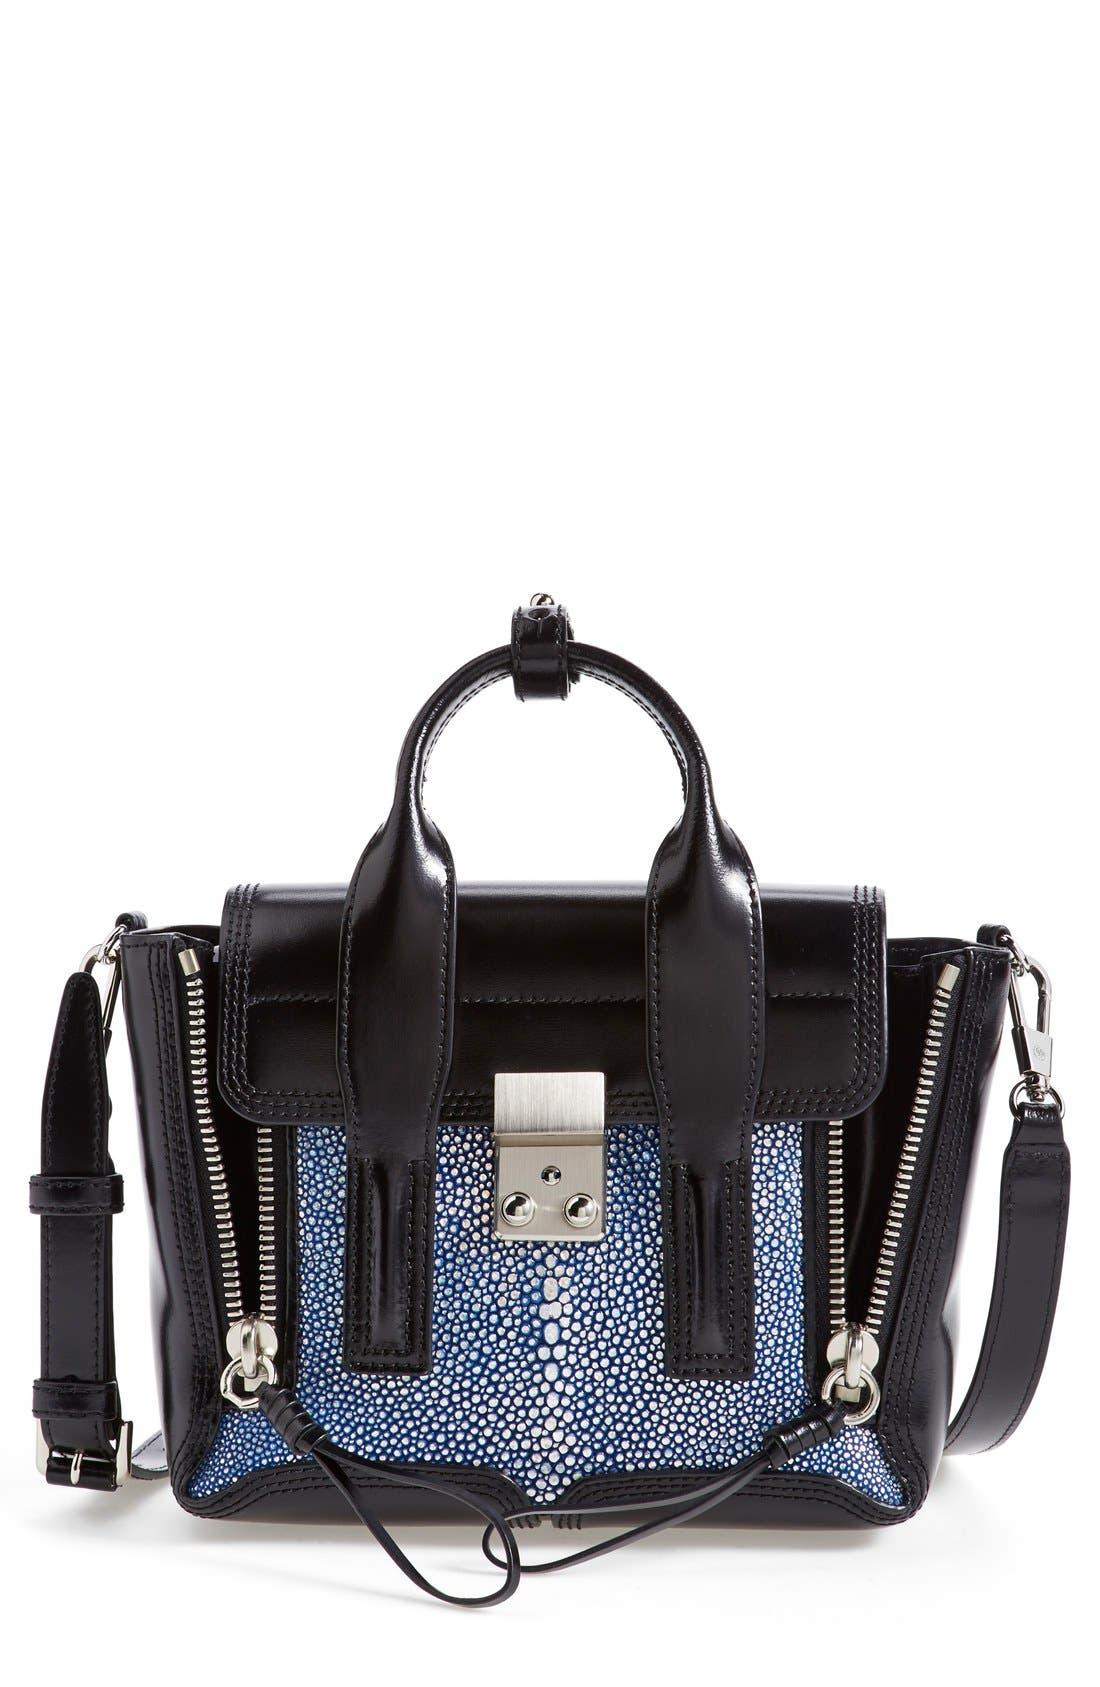 Main Image - 3.1 Phillip Lim 'Pashli Mini' Leather & Stingray Satchel